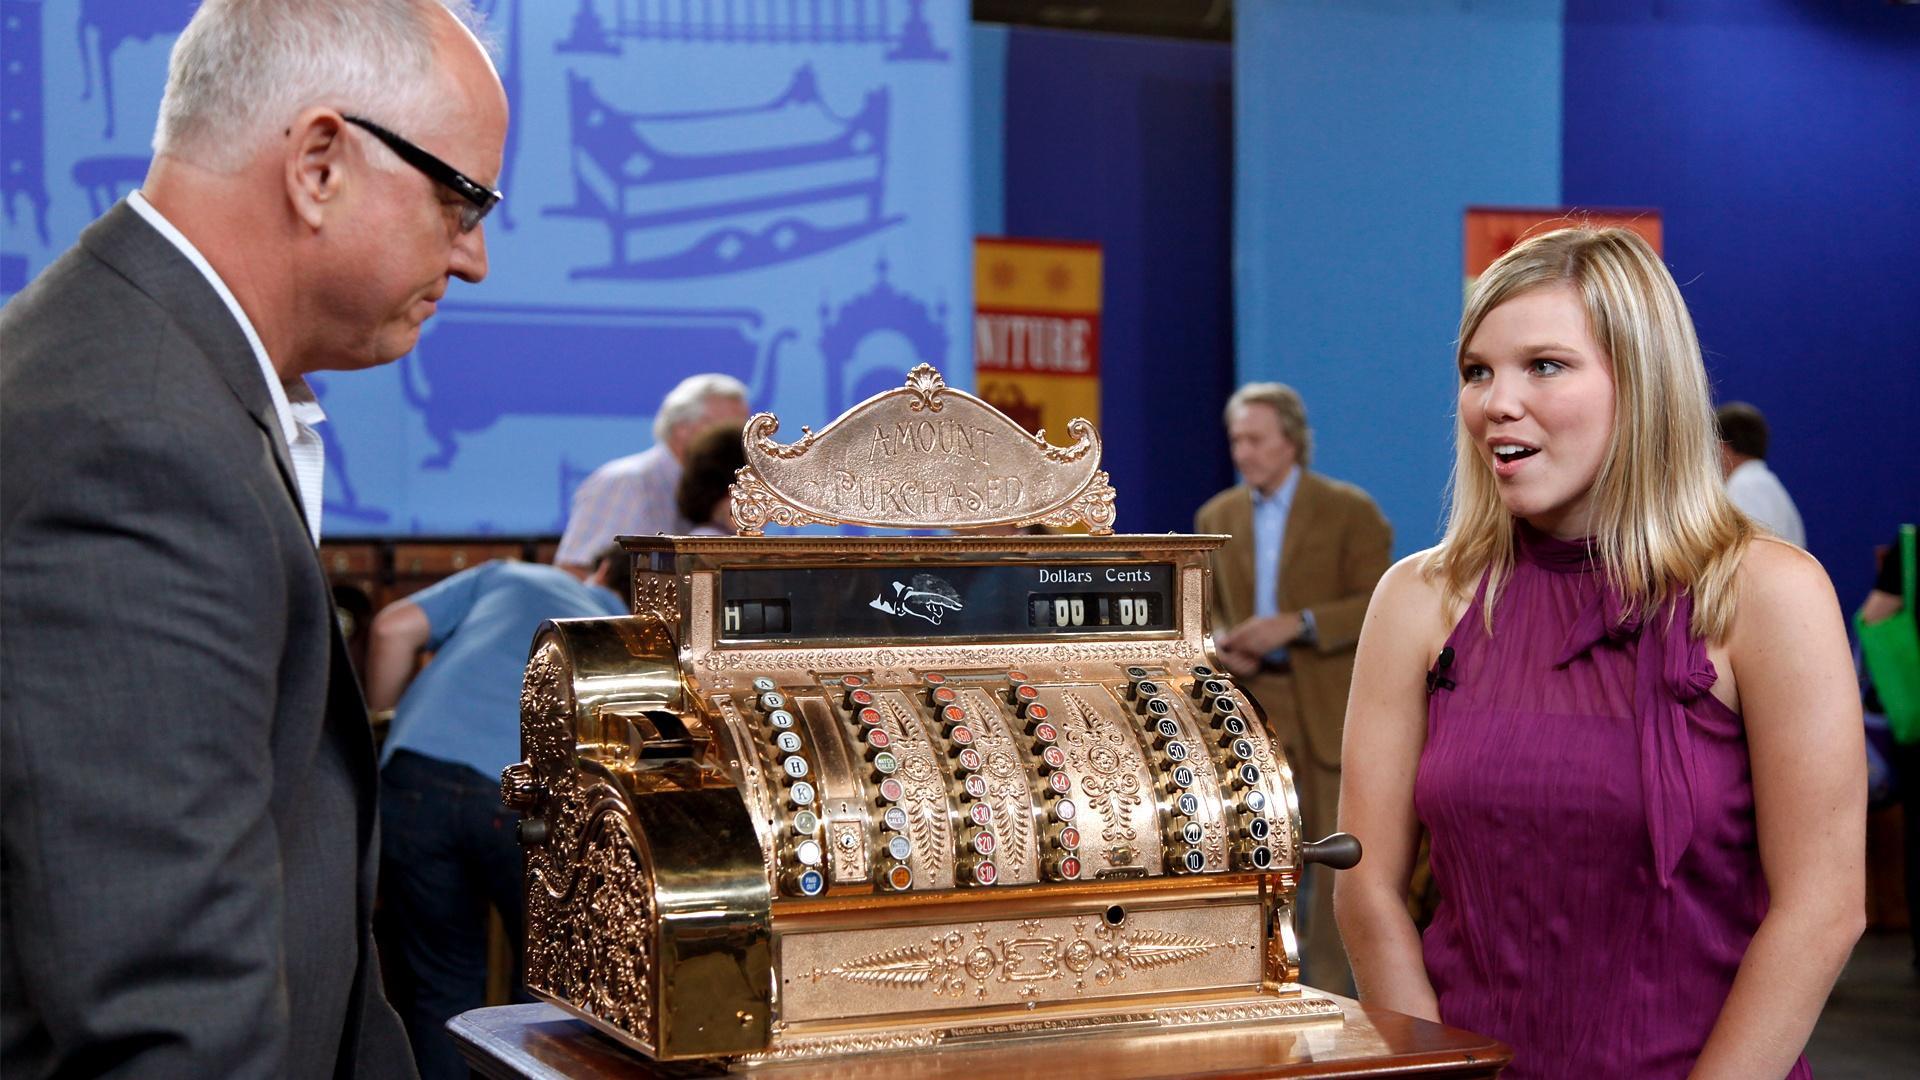 Appraisal: National Cash Register Brass Cash Register